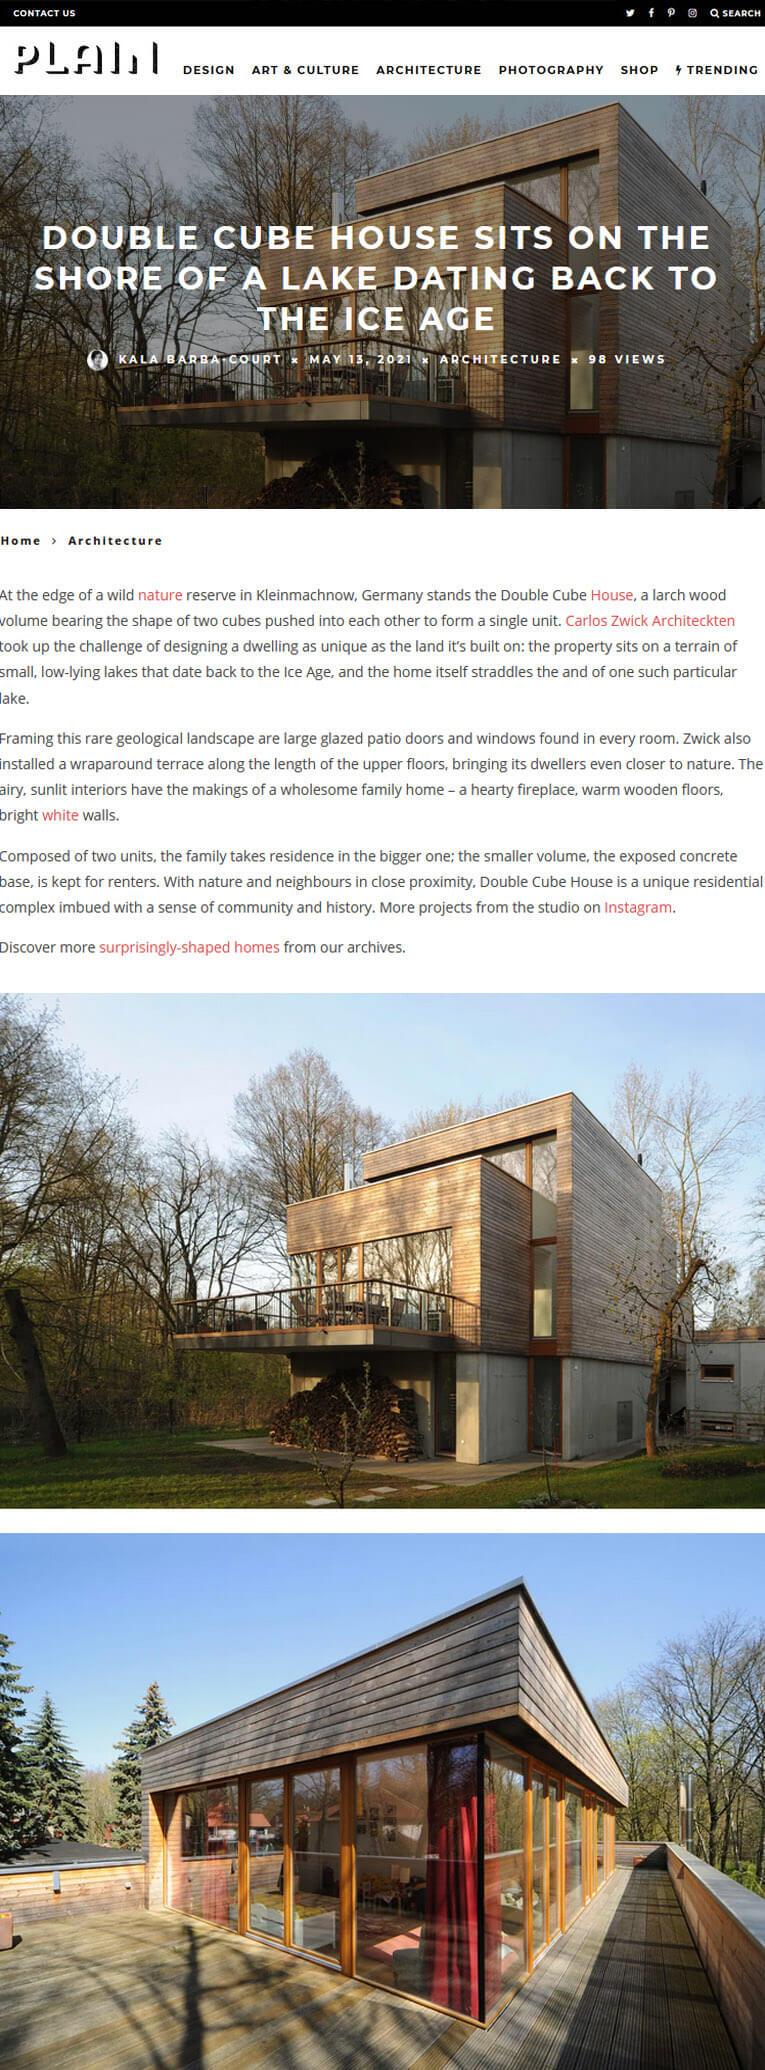 Double Cube House in Plain Magazine